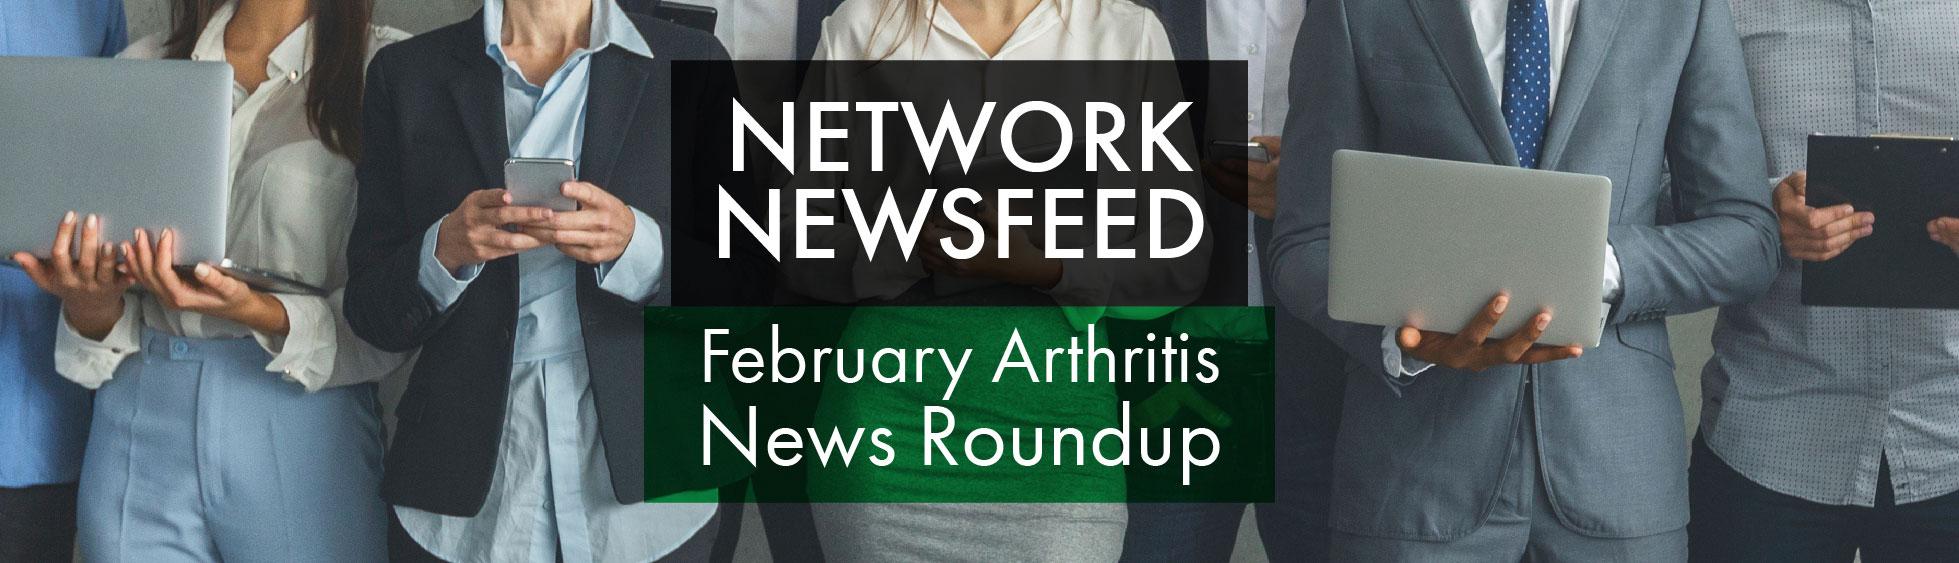 February 2021 Arthritis News Roundup